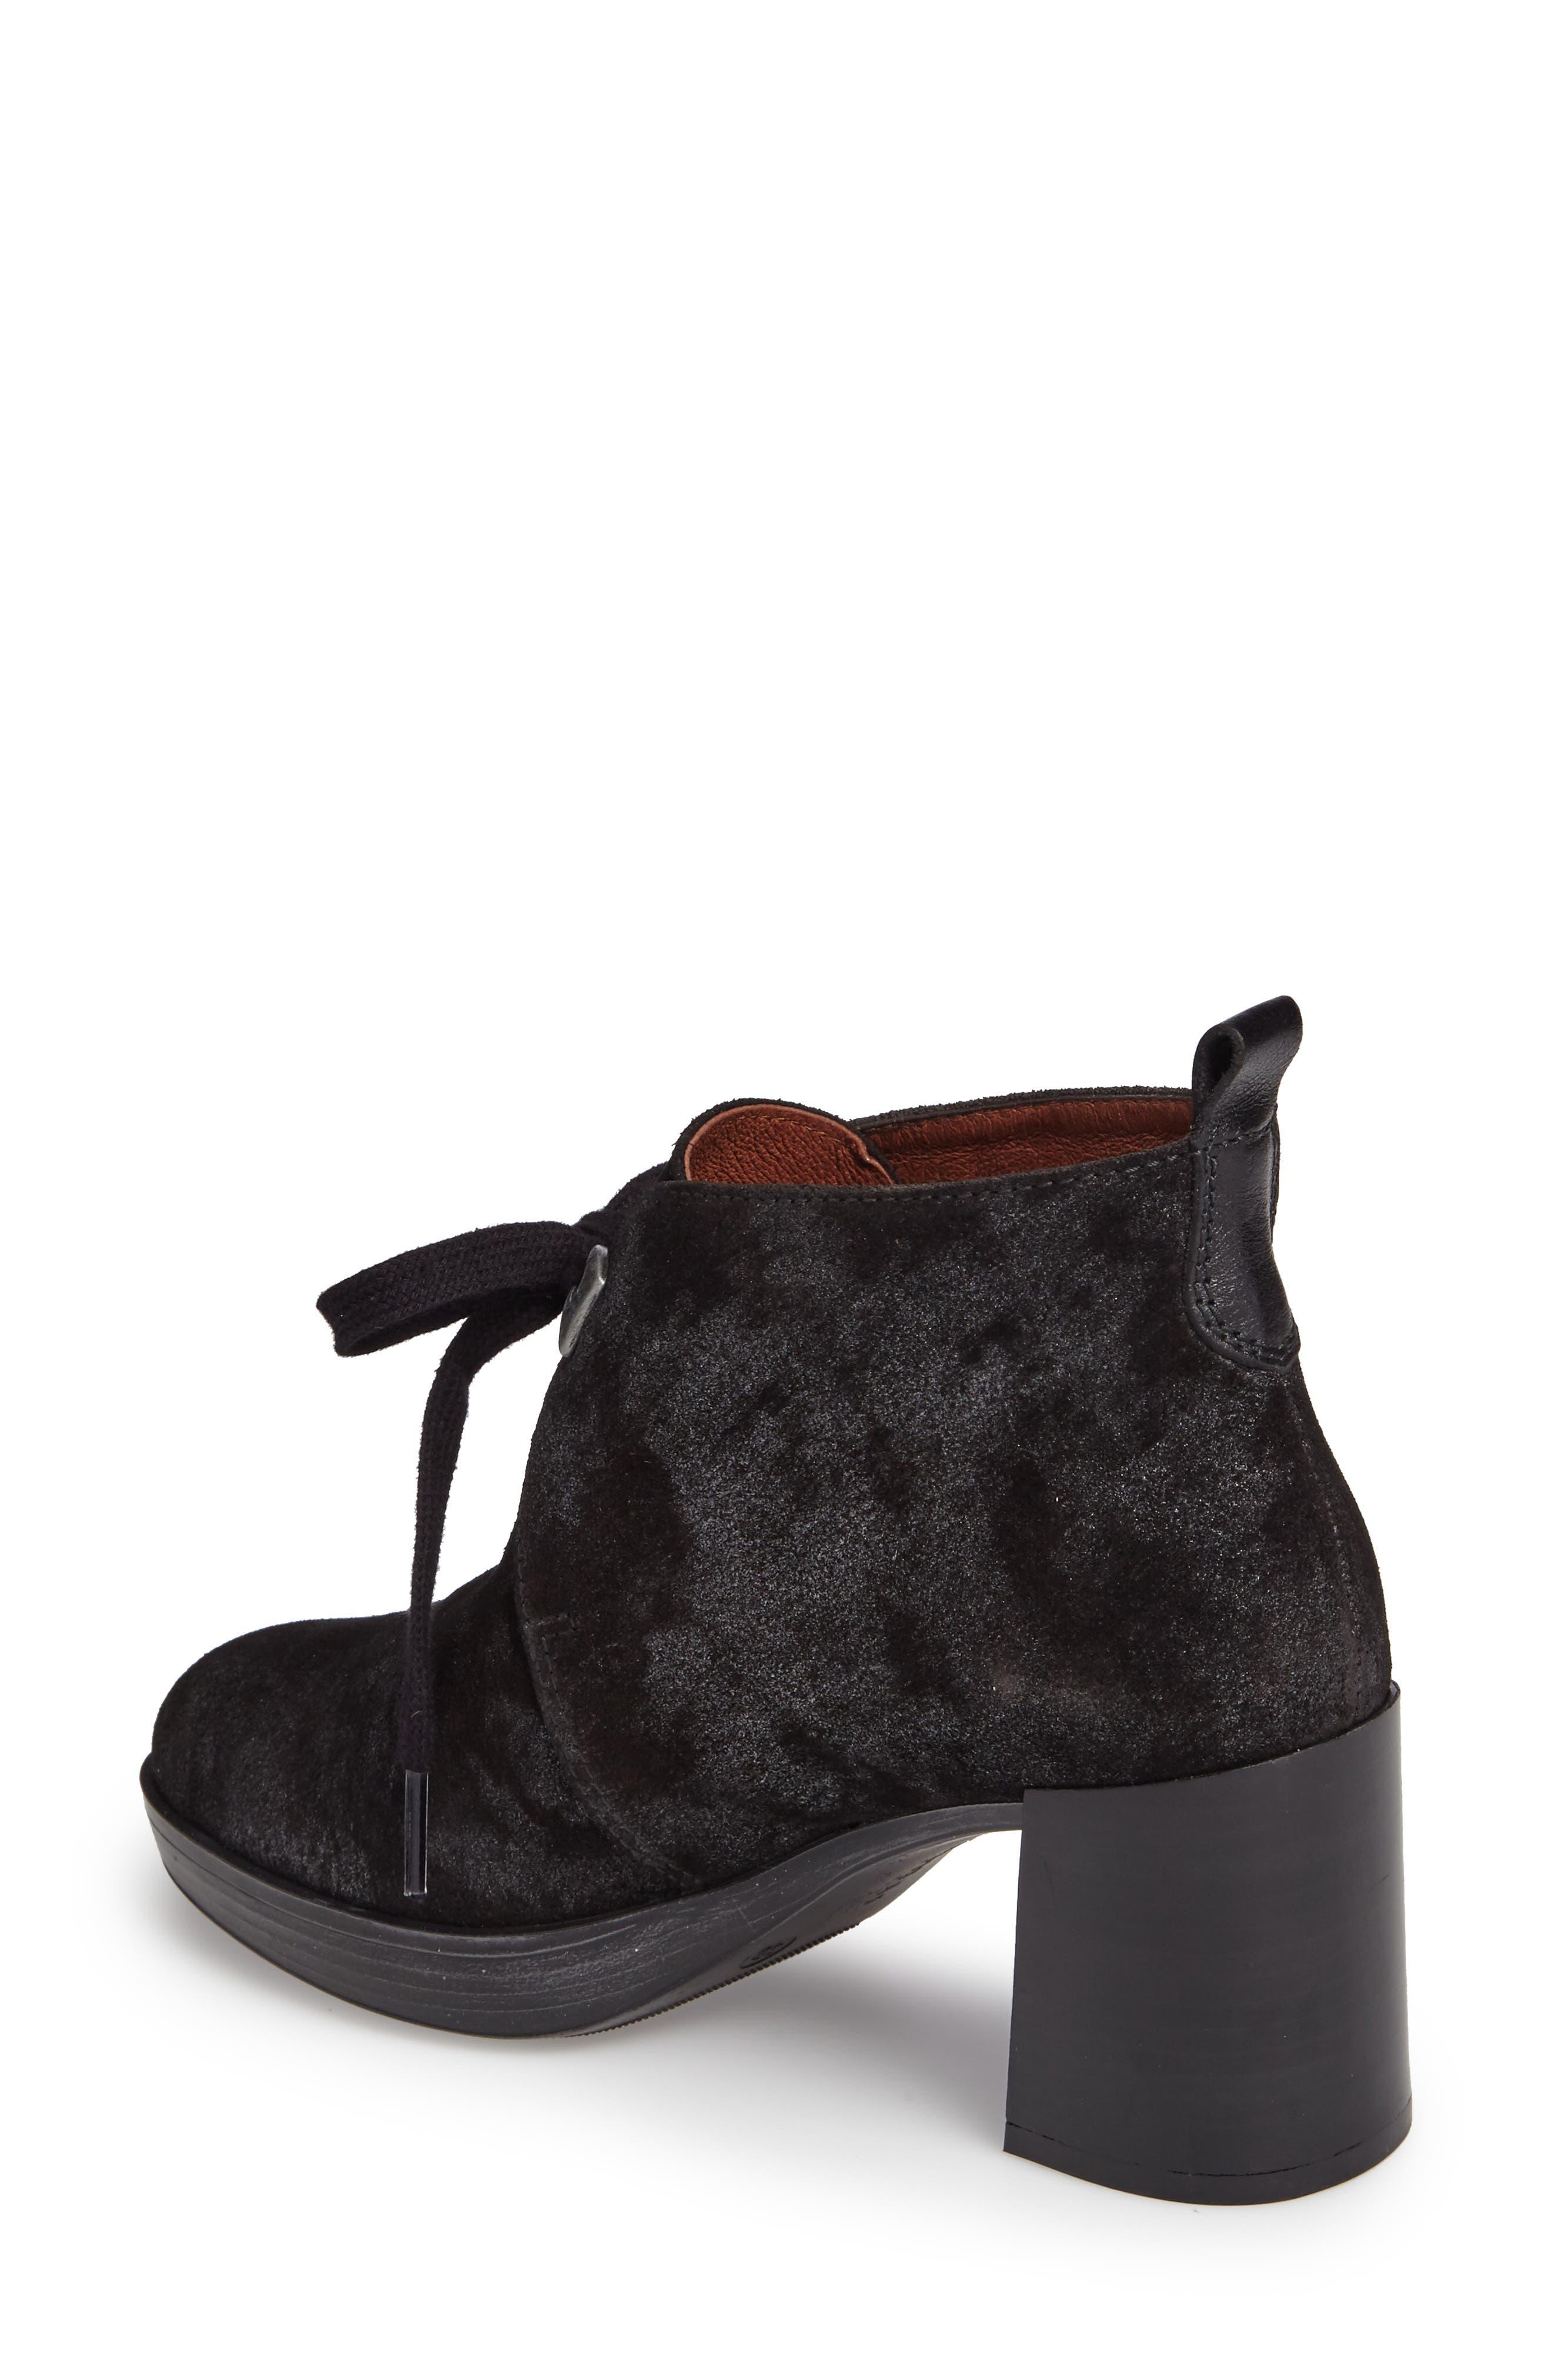 Dasia Bow Bootie,                             Alternate thumbnail 2, color,                             Brut Black Leather